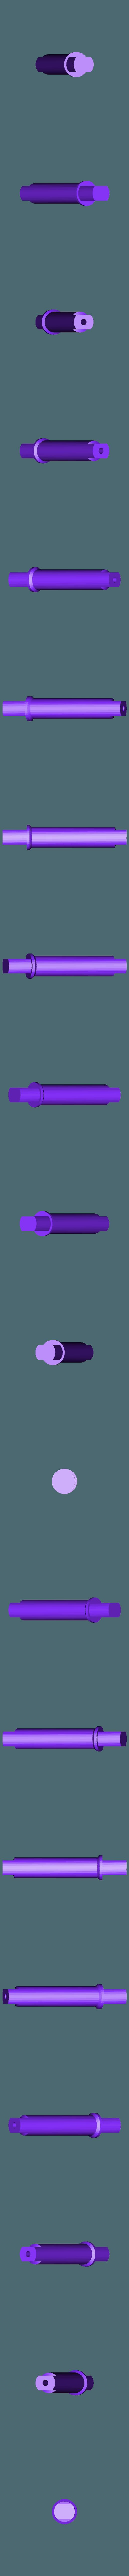 Truck_V4_Axle_Diff_Halfshaft_Front.STL Download STL file 3D Printed Rc Truck V4 • 3D printable template, MrCrankyface